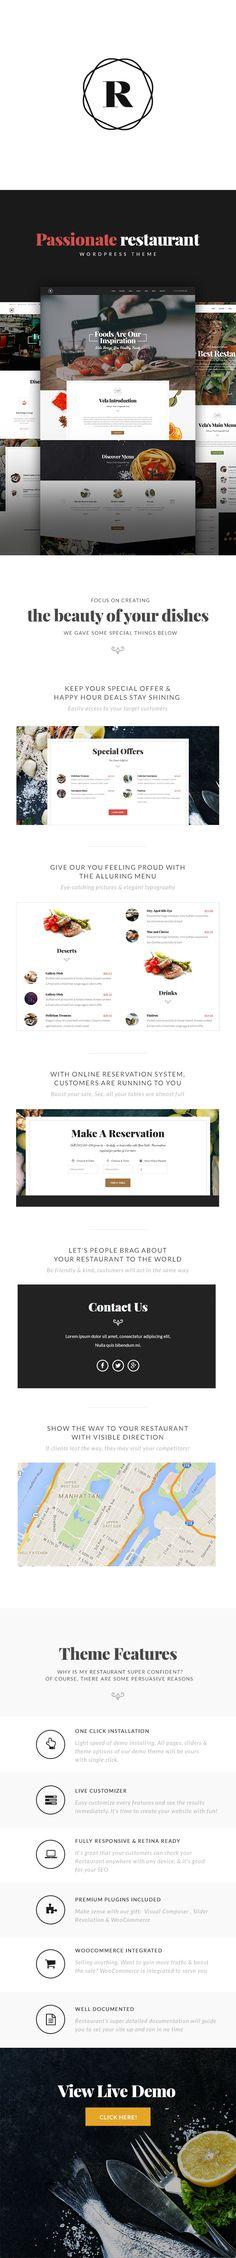 Restaurant, Cafe, Bar WordPress Theme - Restaurant